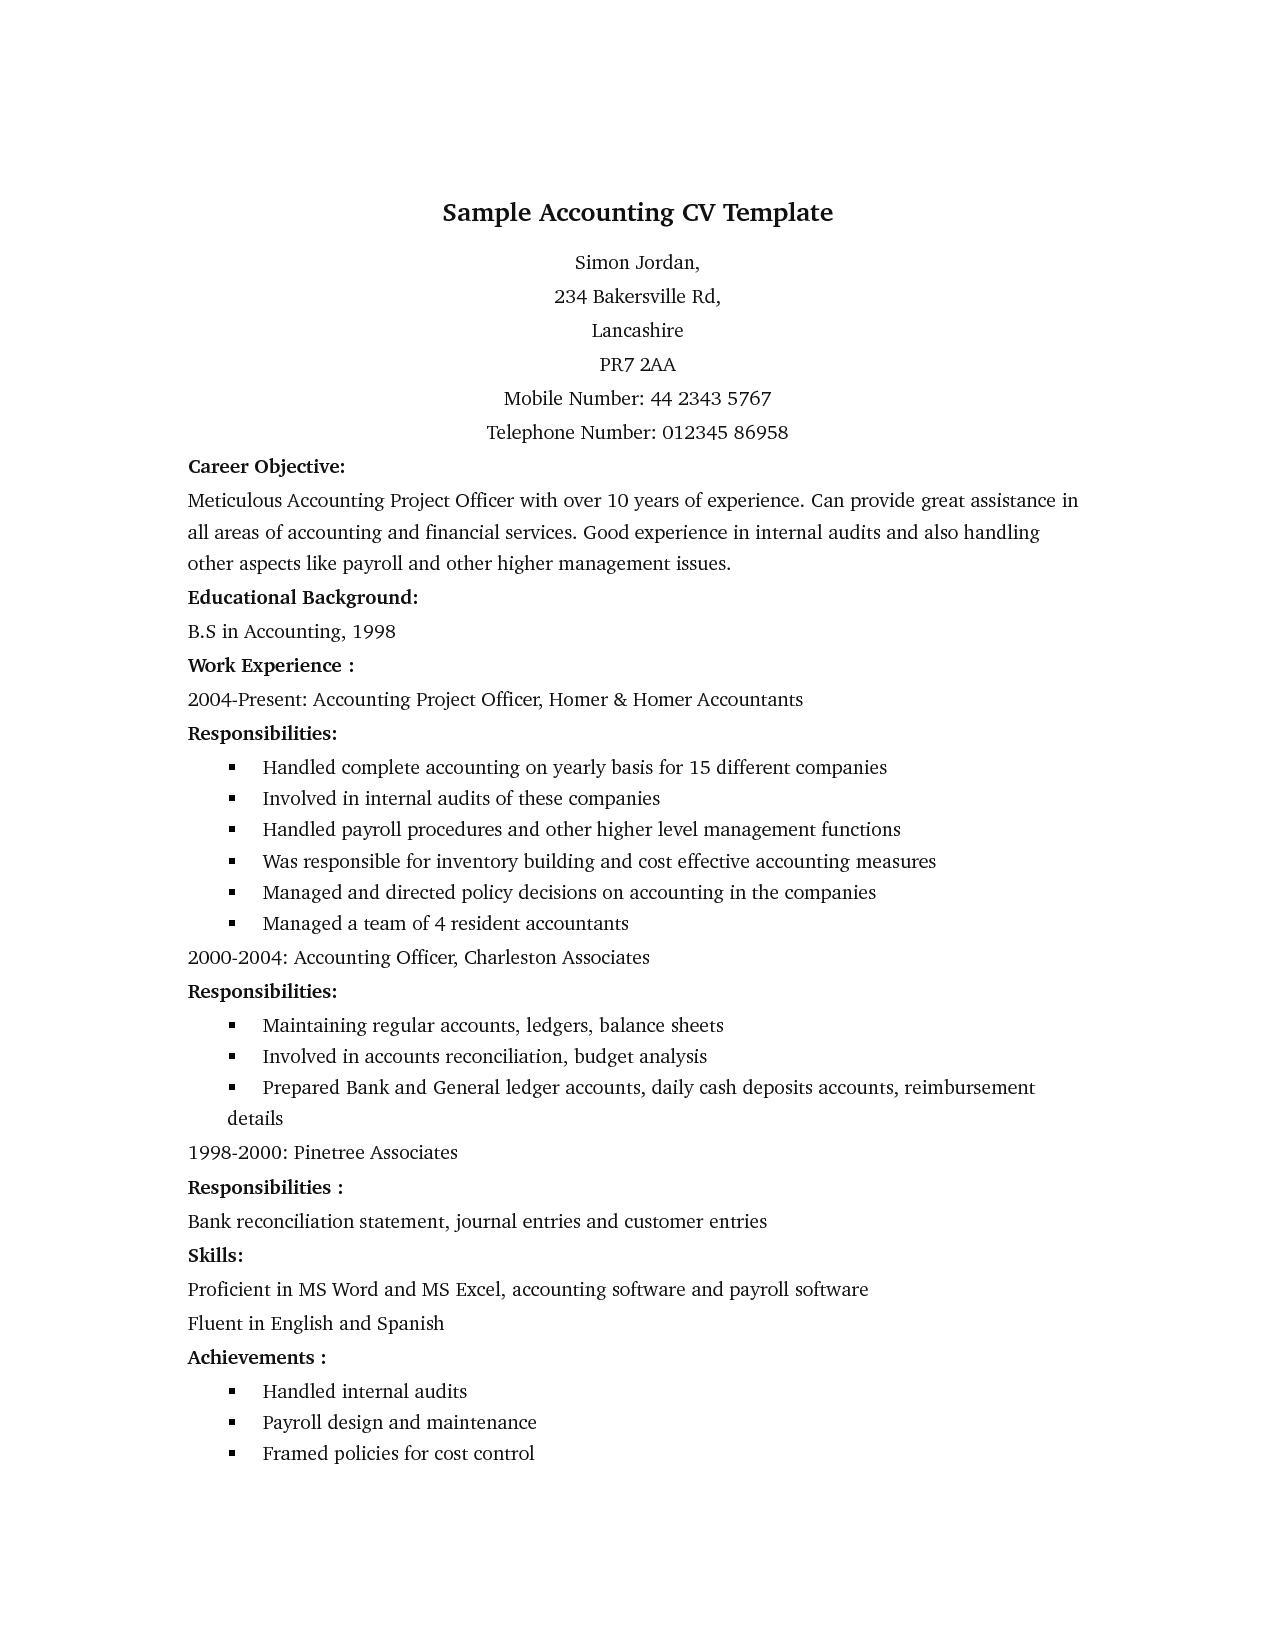 resume accountant samples